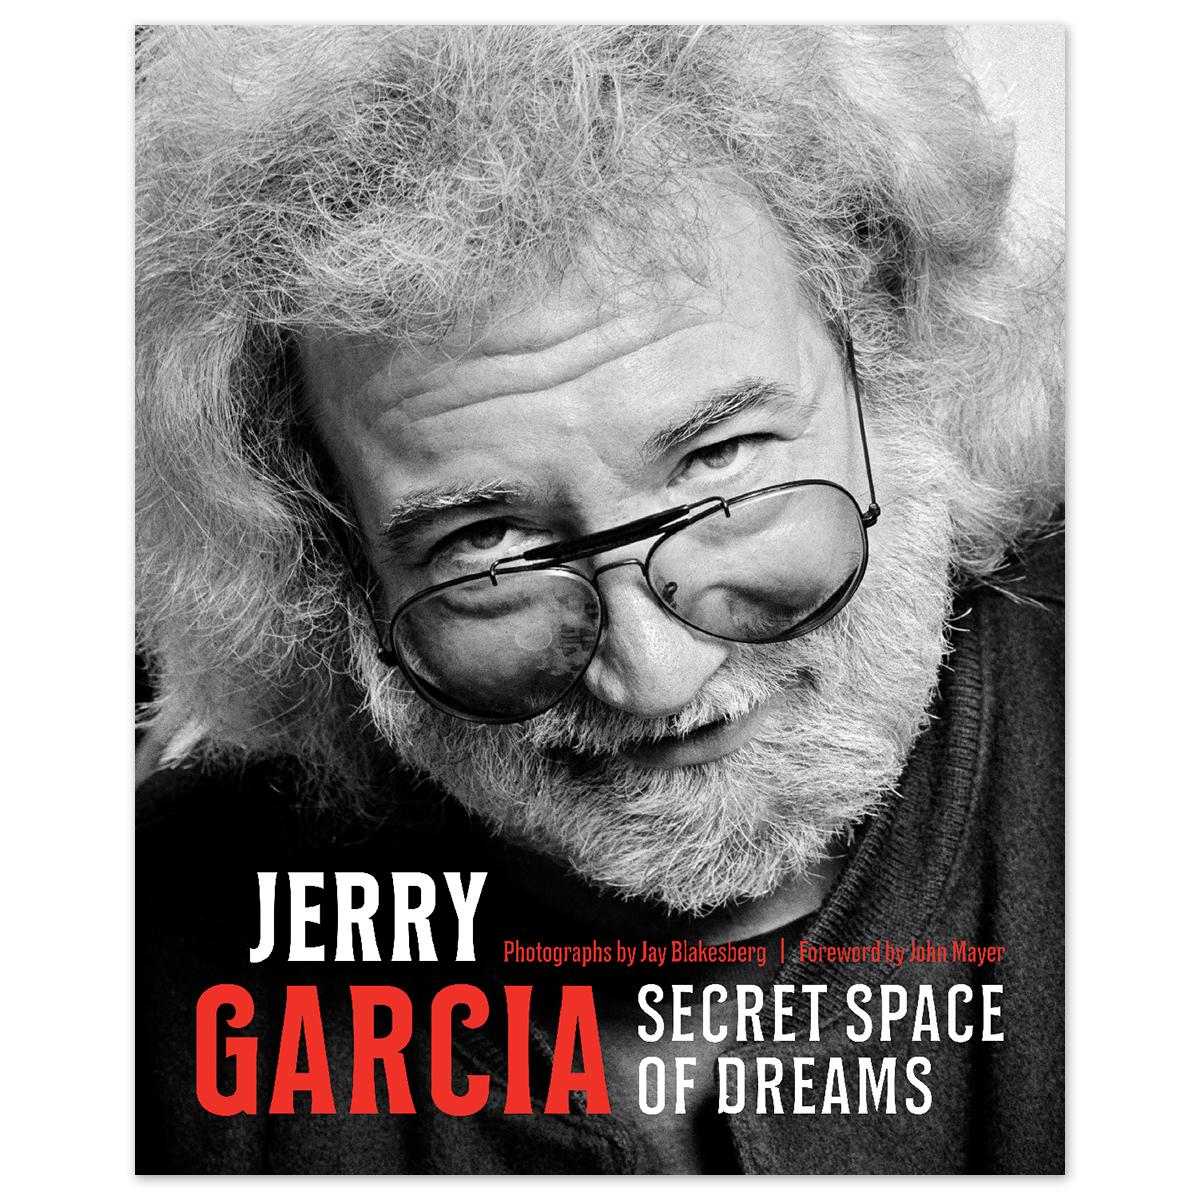 Jerry Garcia - Secret Space of Dreams